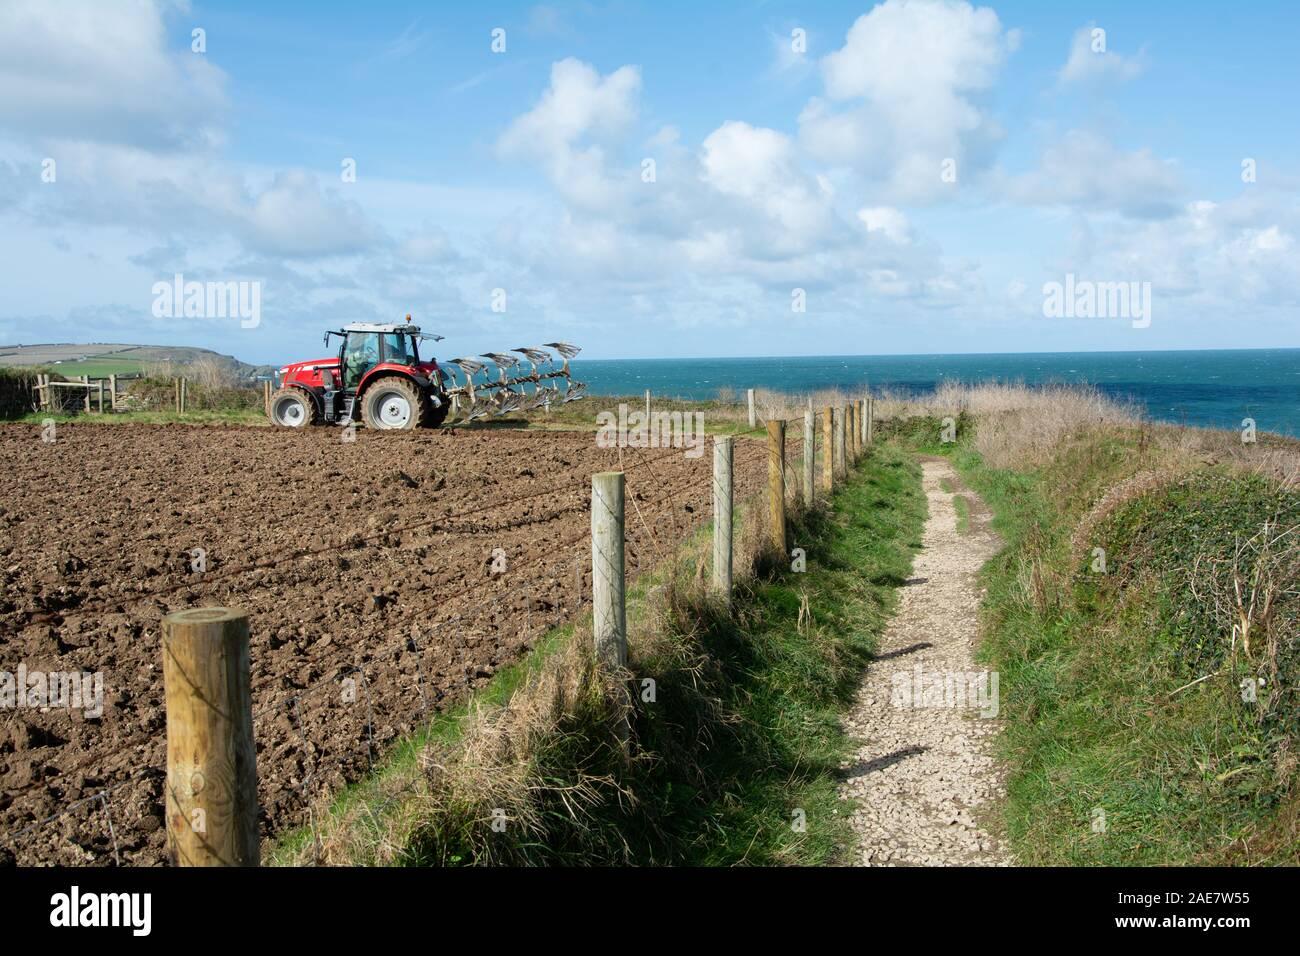 October 2019 - A farmer ploughs his field on a coastal farm in Trevose Head,Cornwall, UK Stock Photo